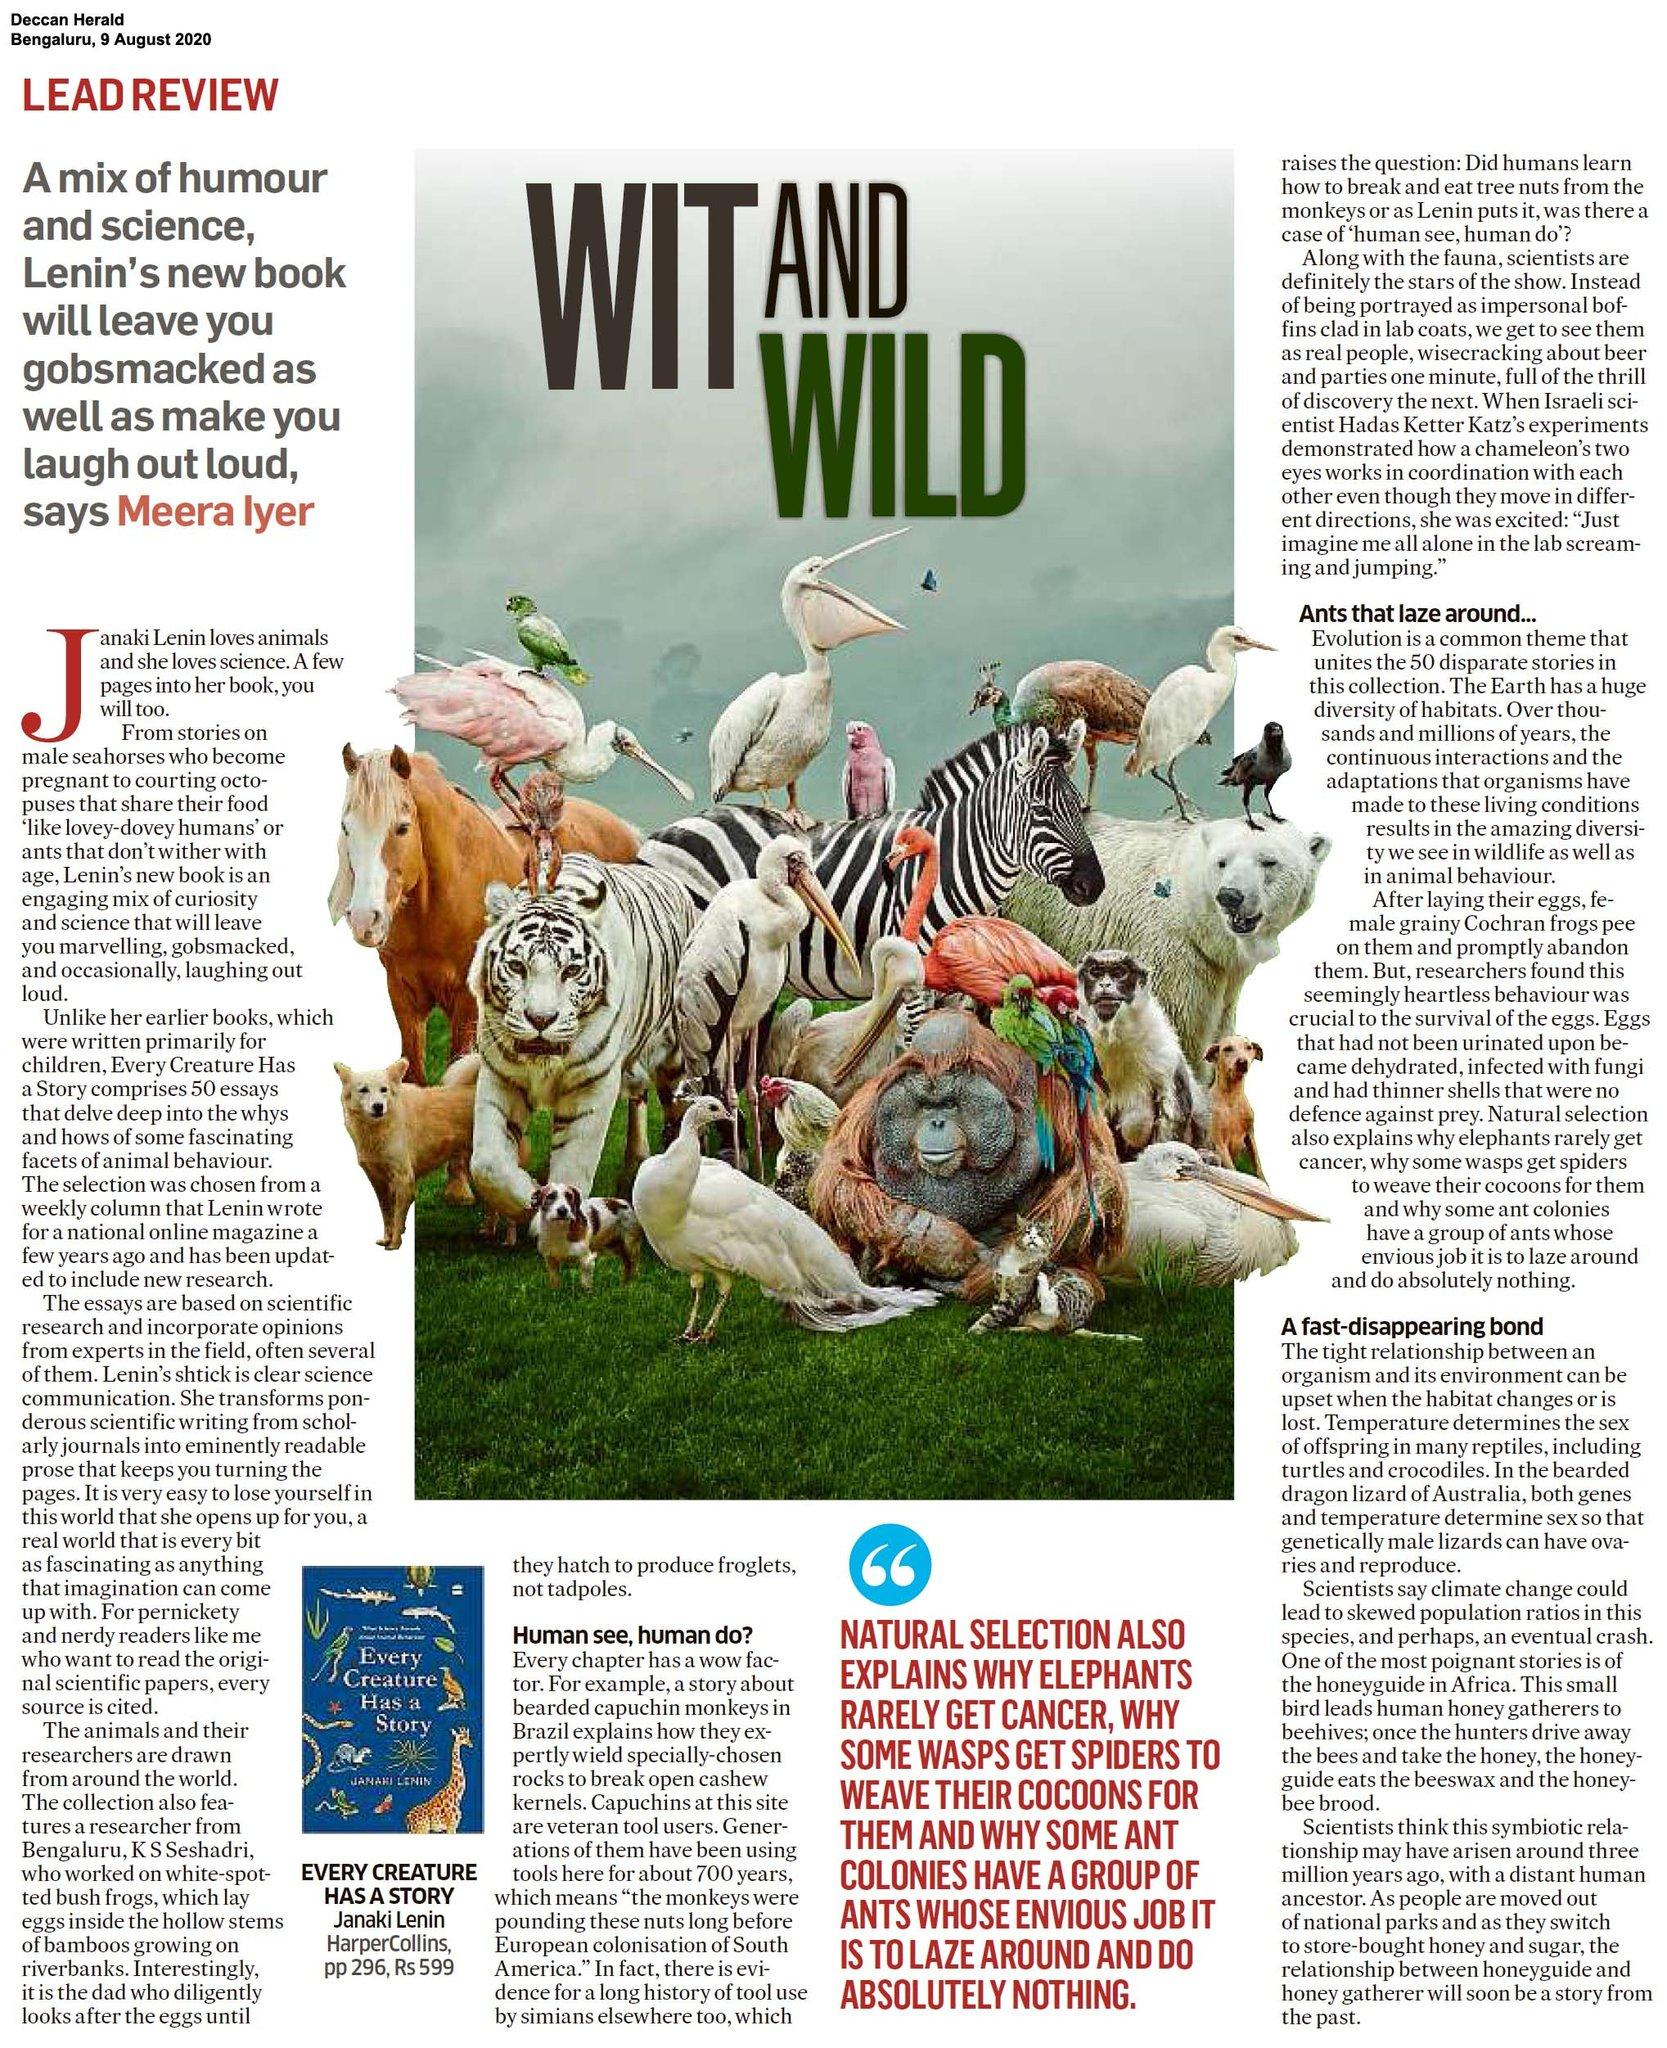 Deccan Herald review